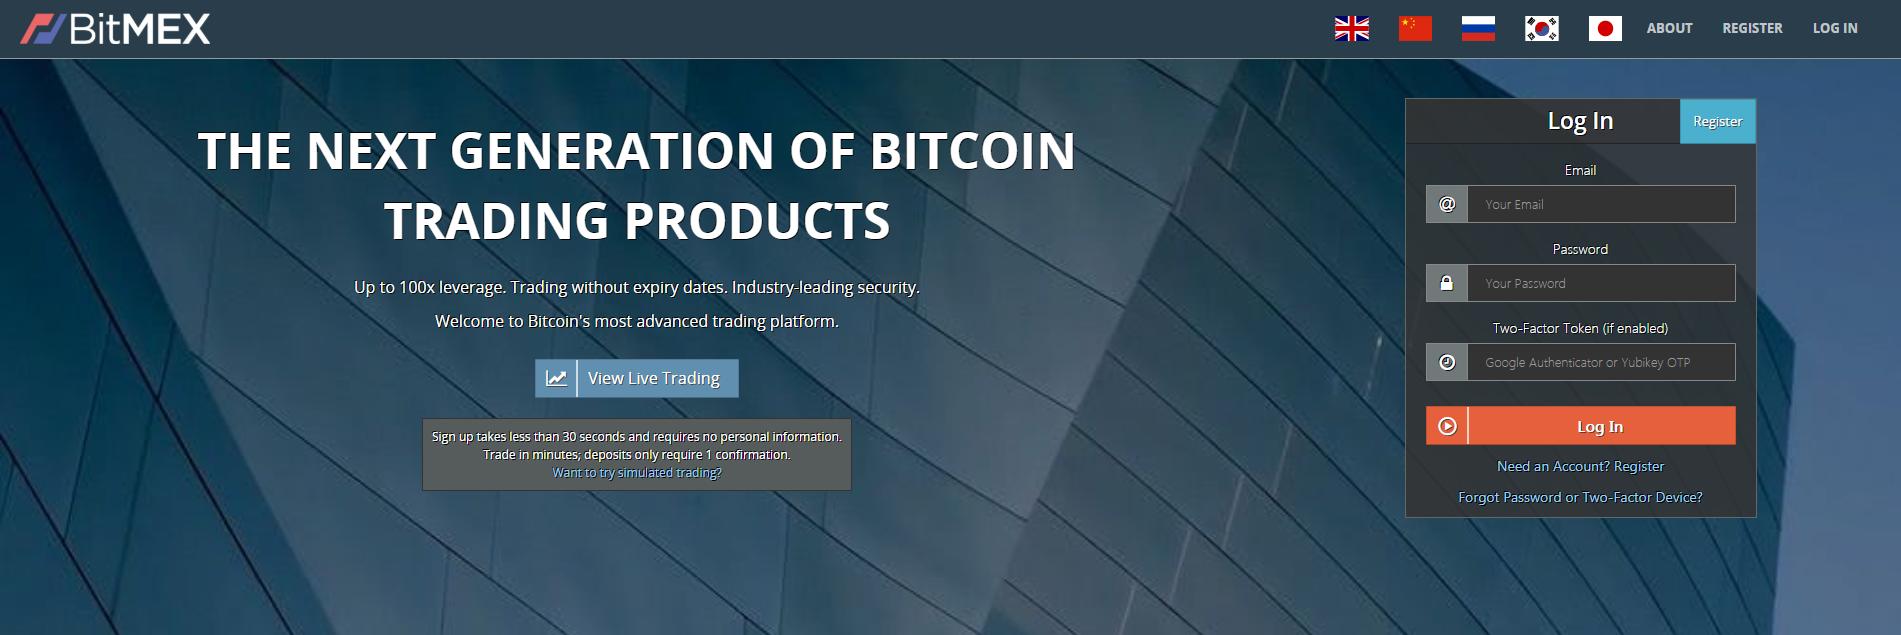 BitMEX Review